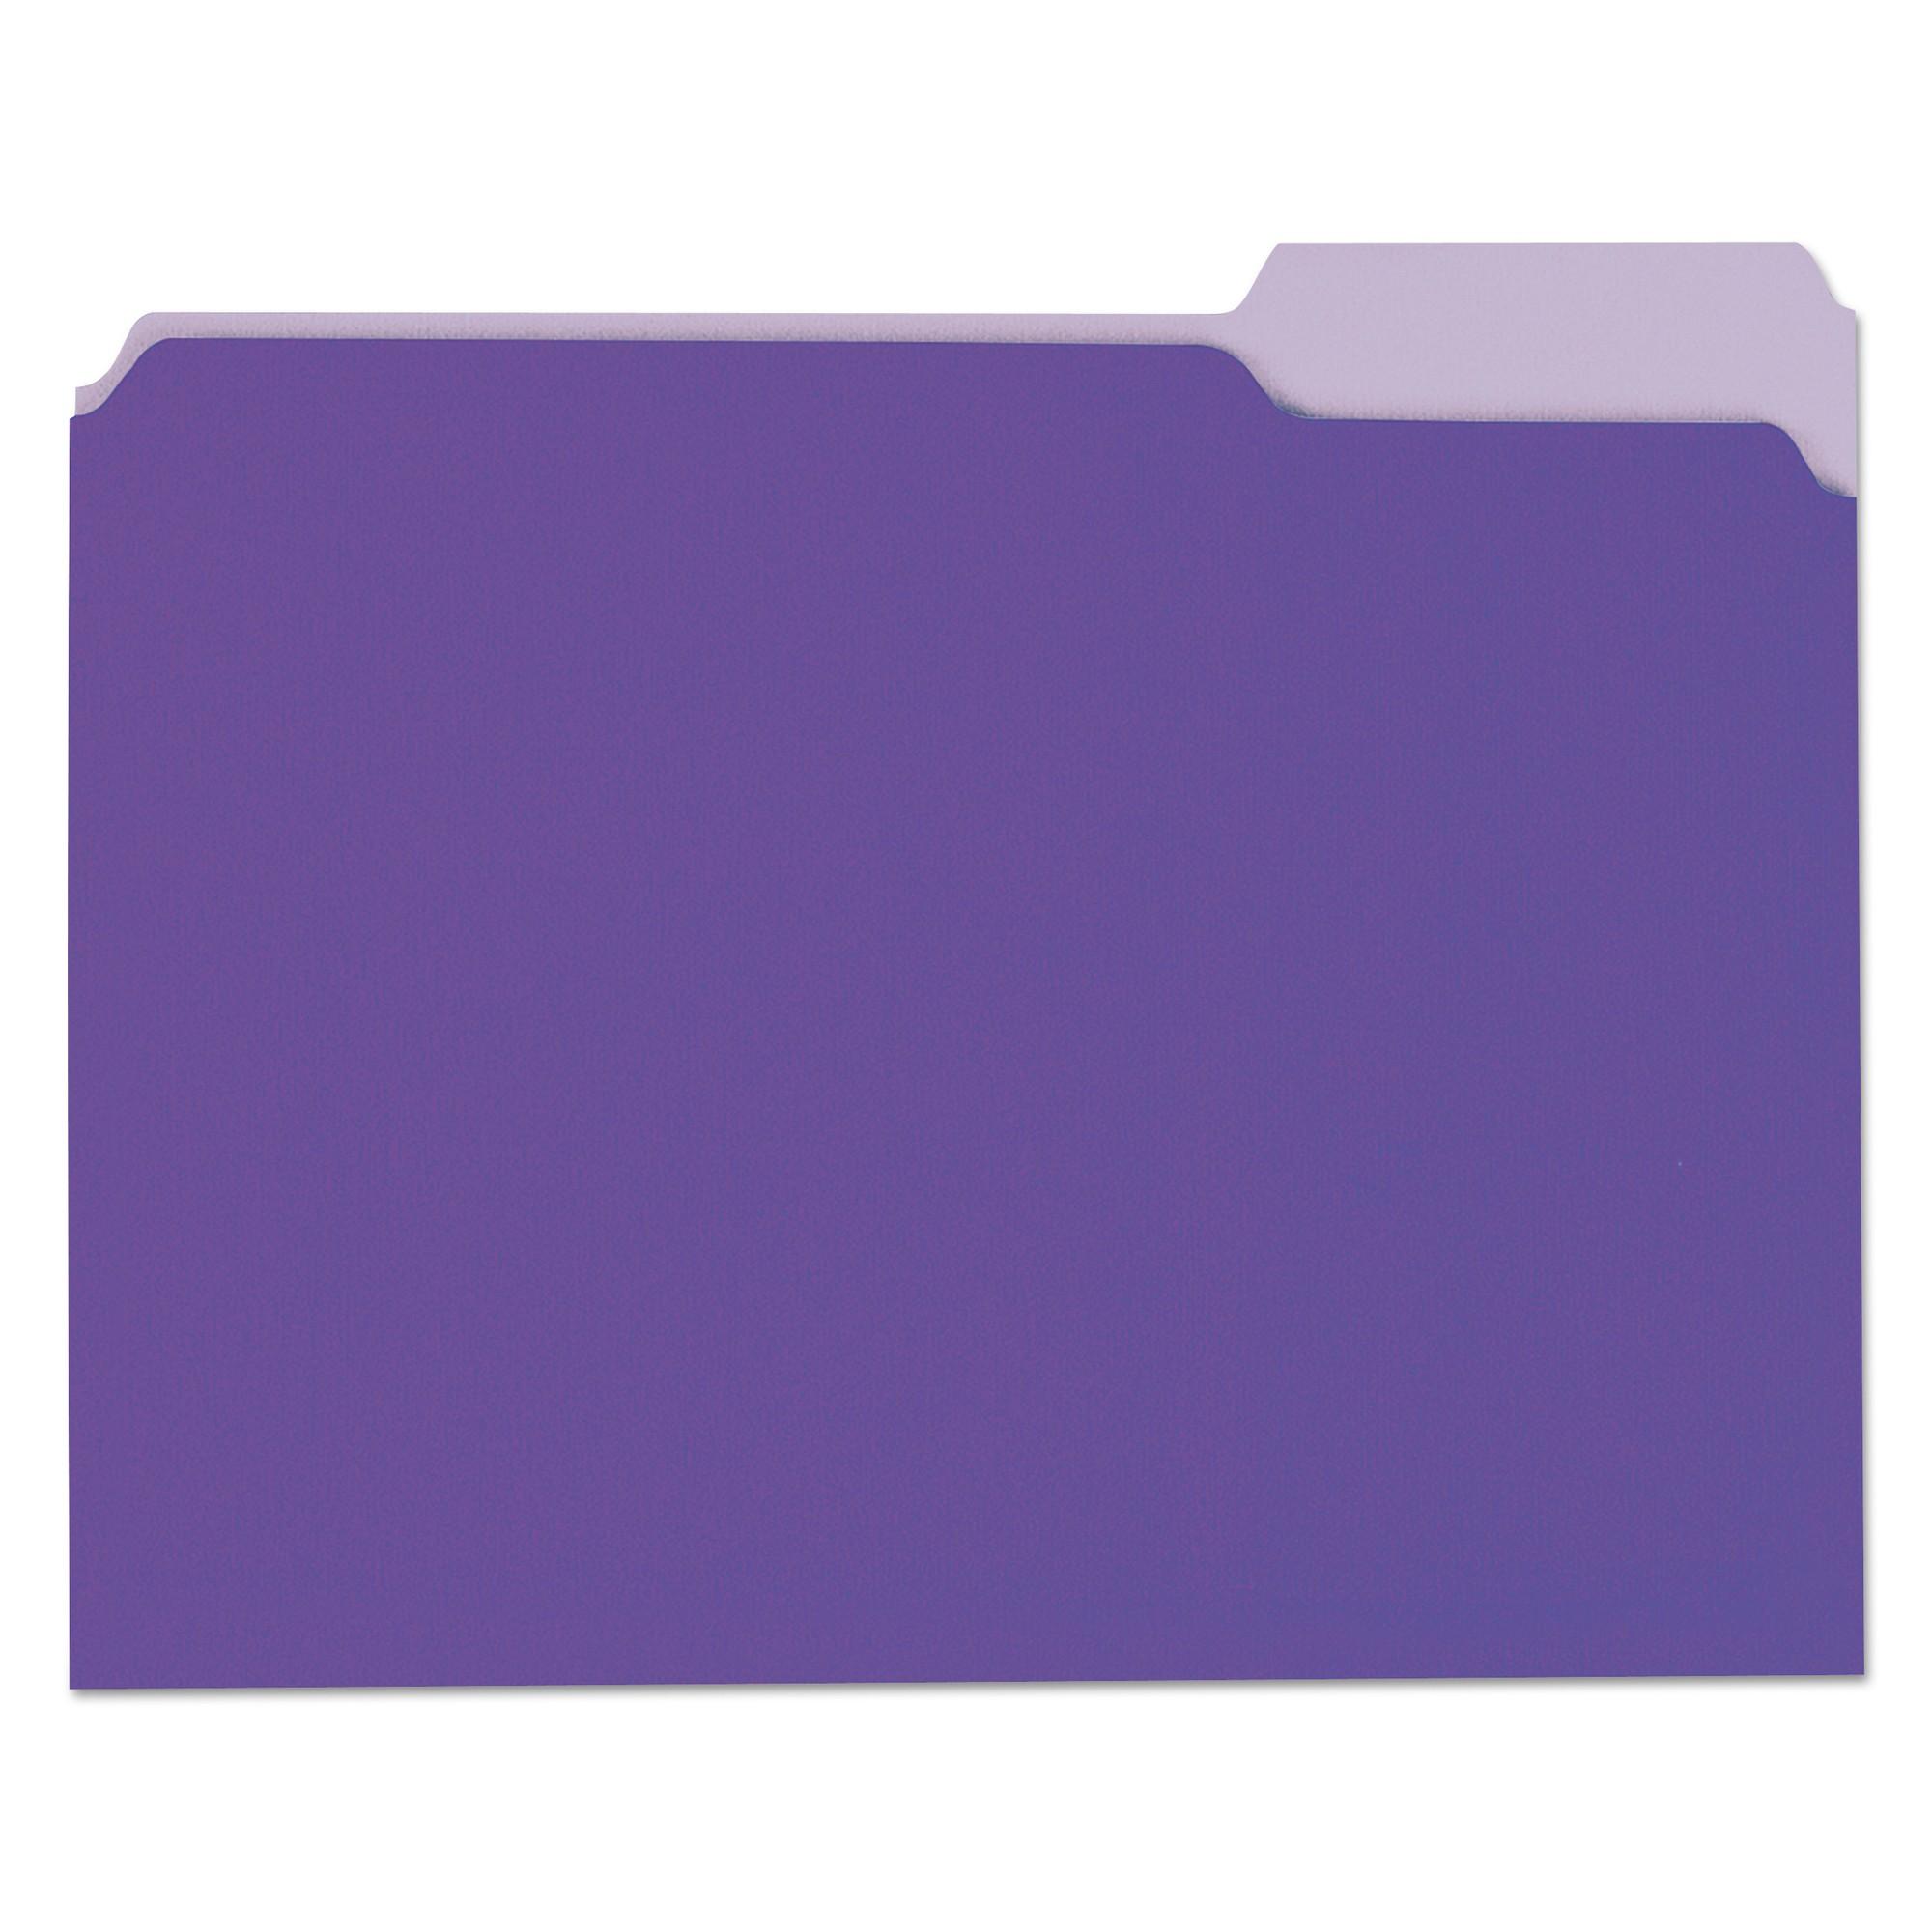 File Folders, 1/3 Cut One-Ply Top Tab, Letter, Violet/Light Violet, 100/Box